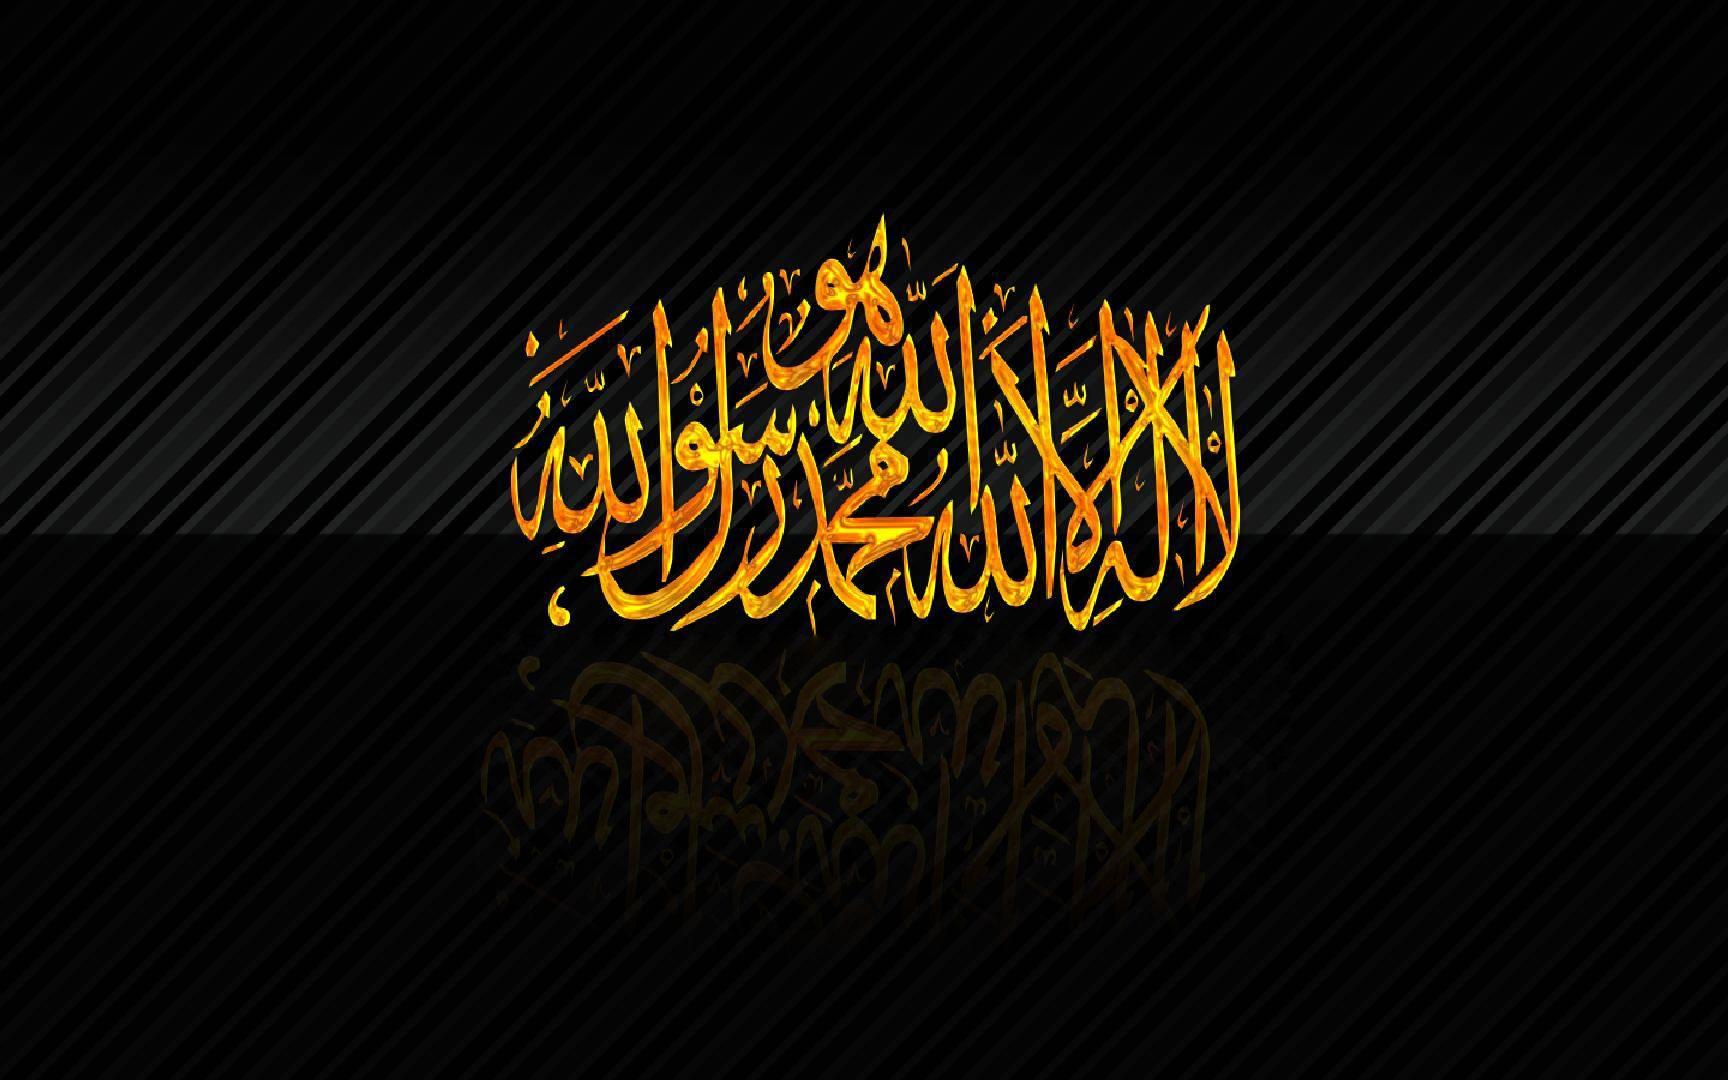 Allah Name Wallpaper Hd Wallpaper Free Download Allah Wallpaper Name Wallpaper Hd Wallpaper Desktop